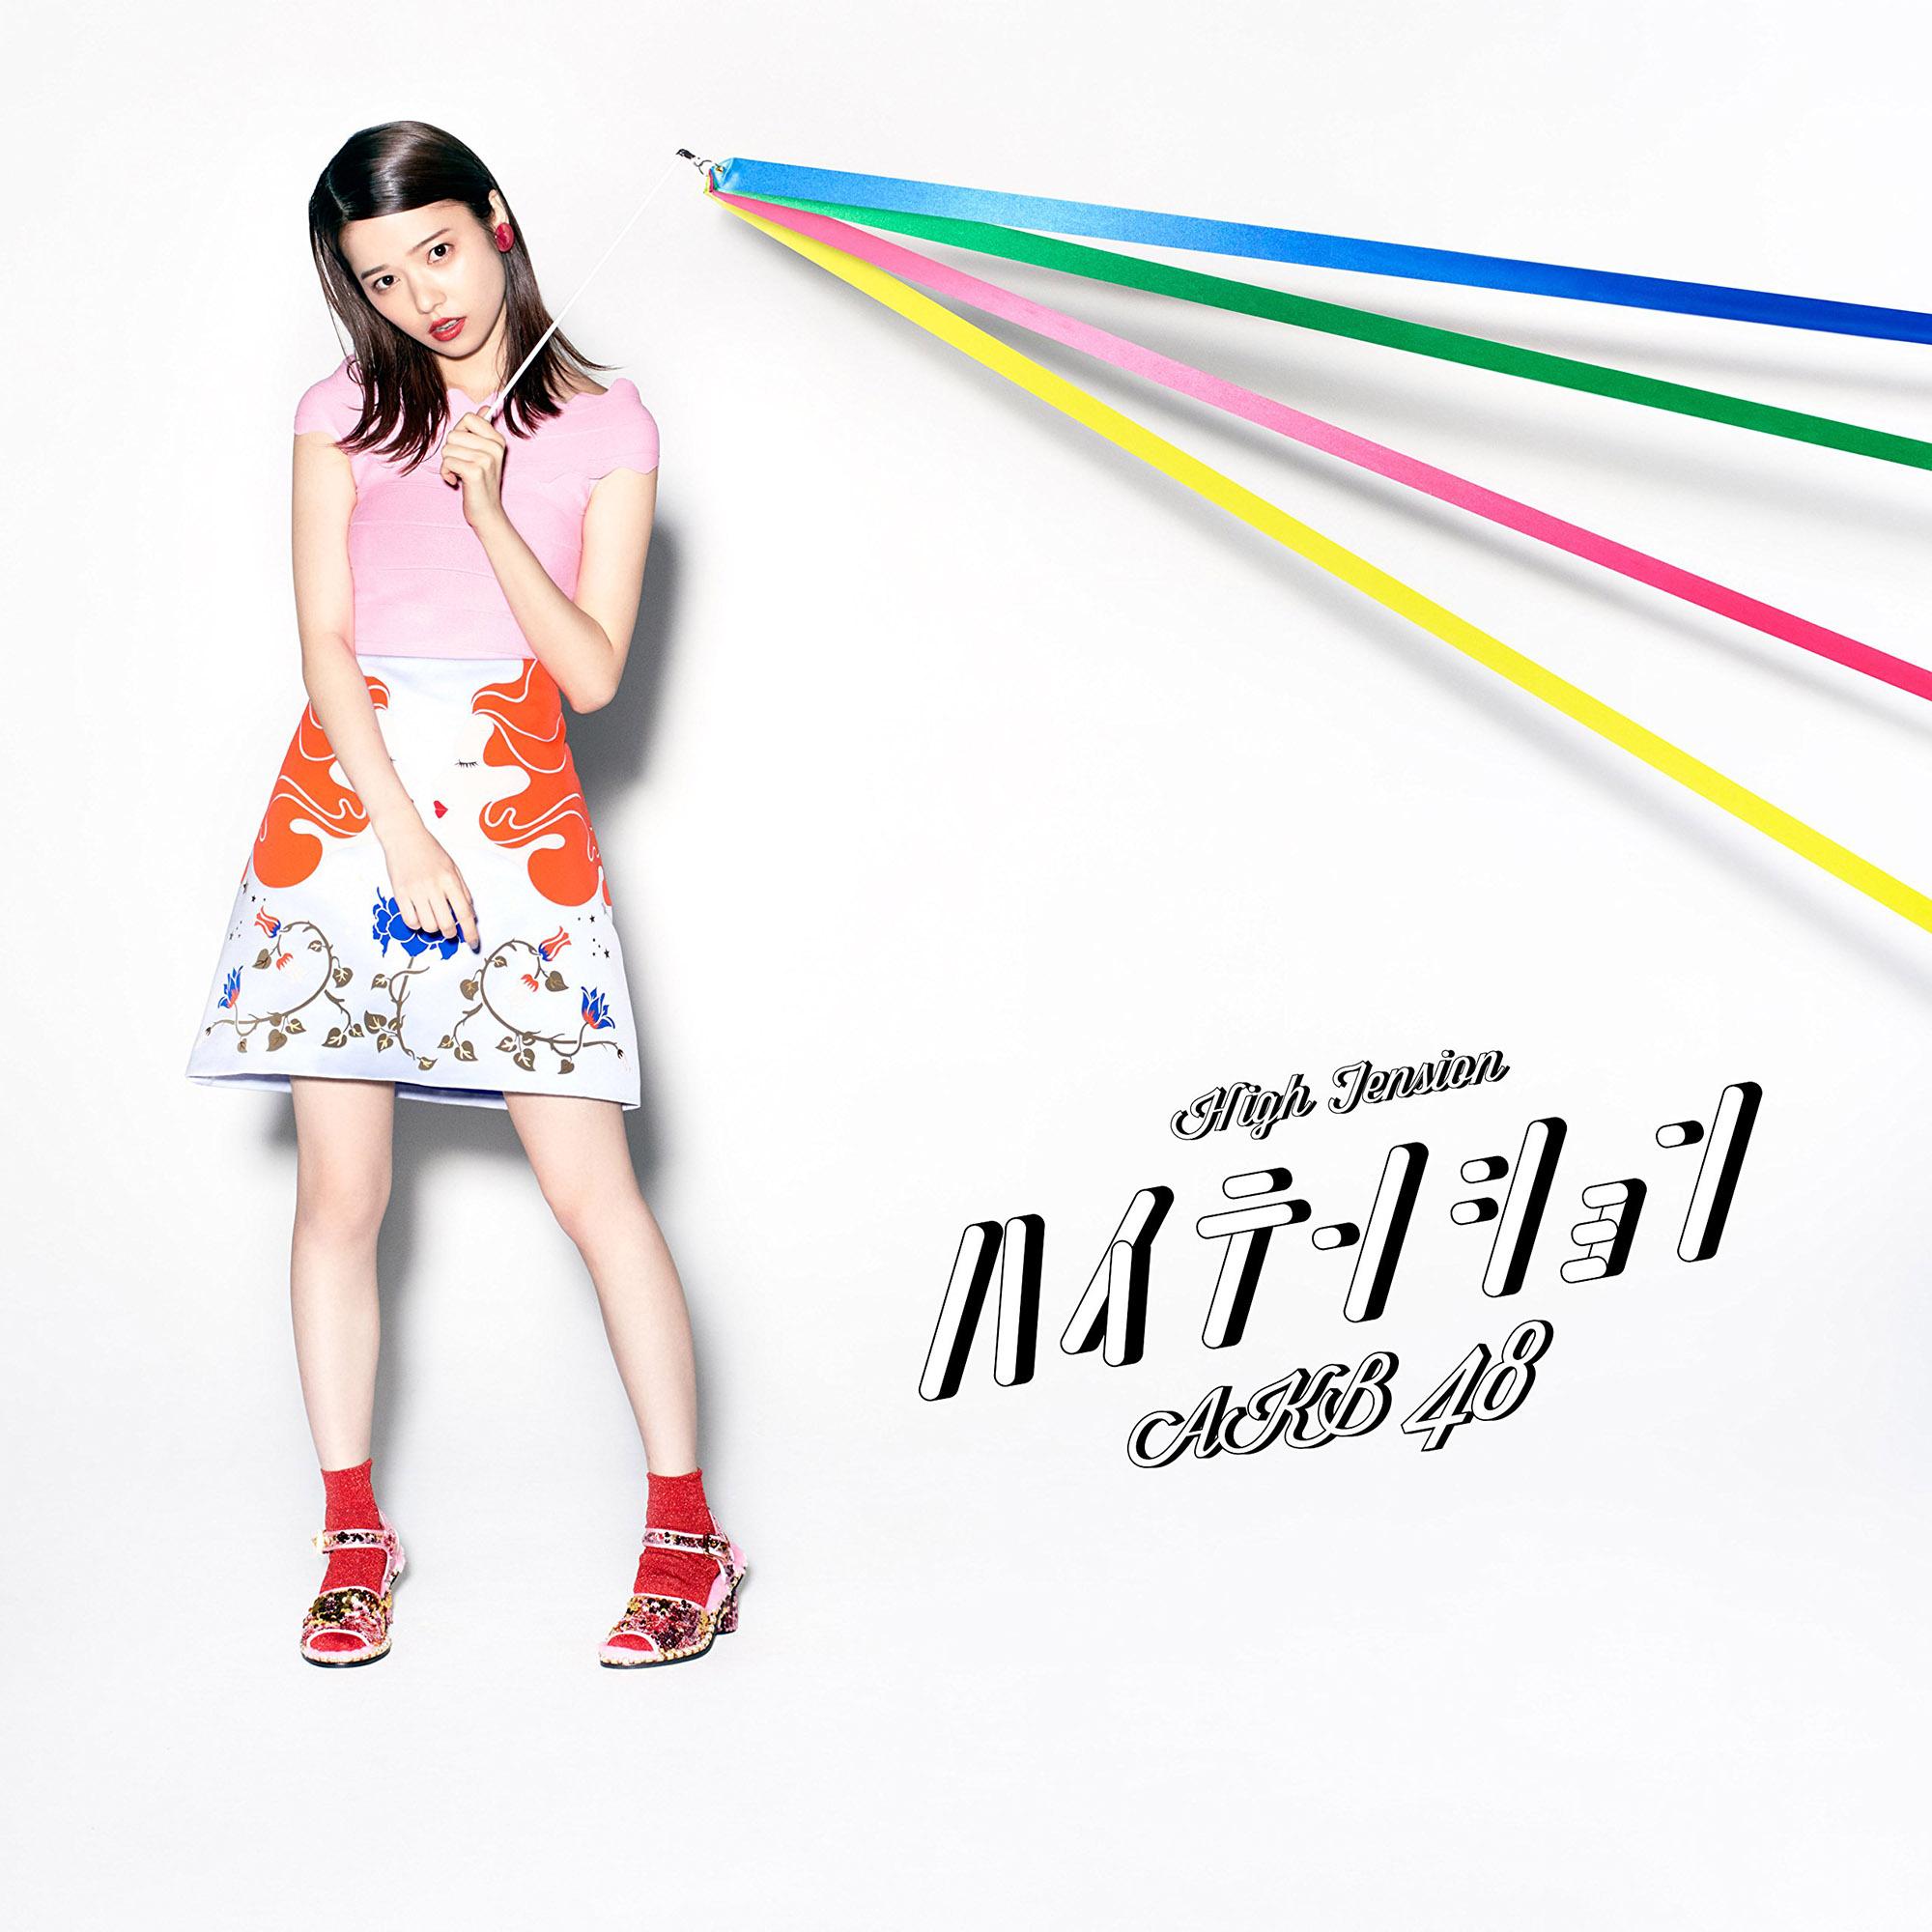 Art Work Japan: AKB48 - ハイテンション 2016/10/29 AKB48